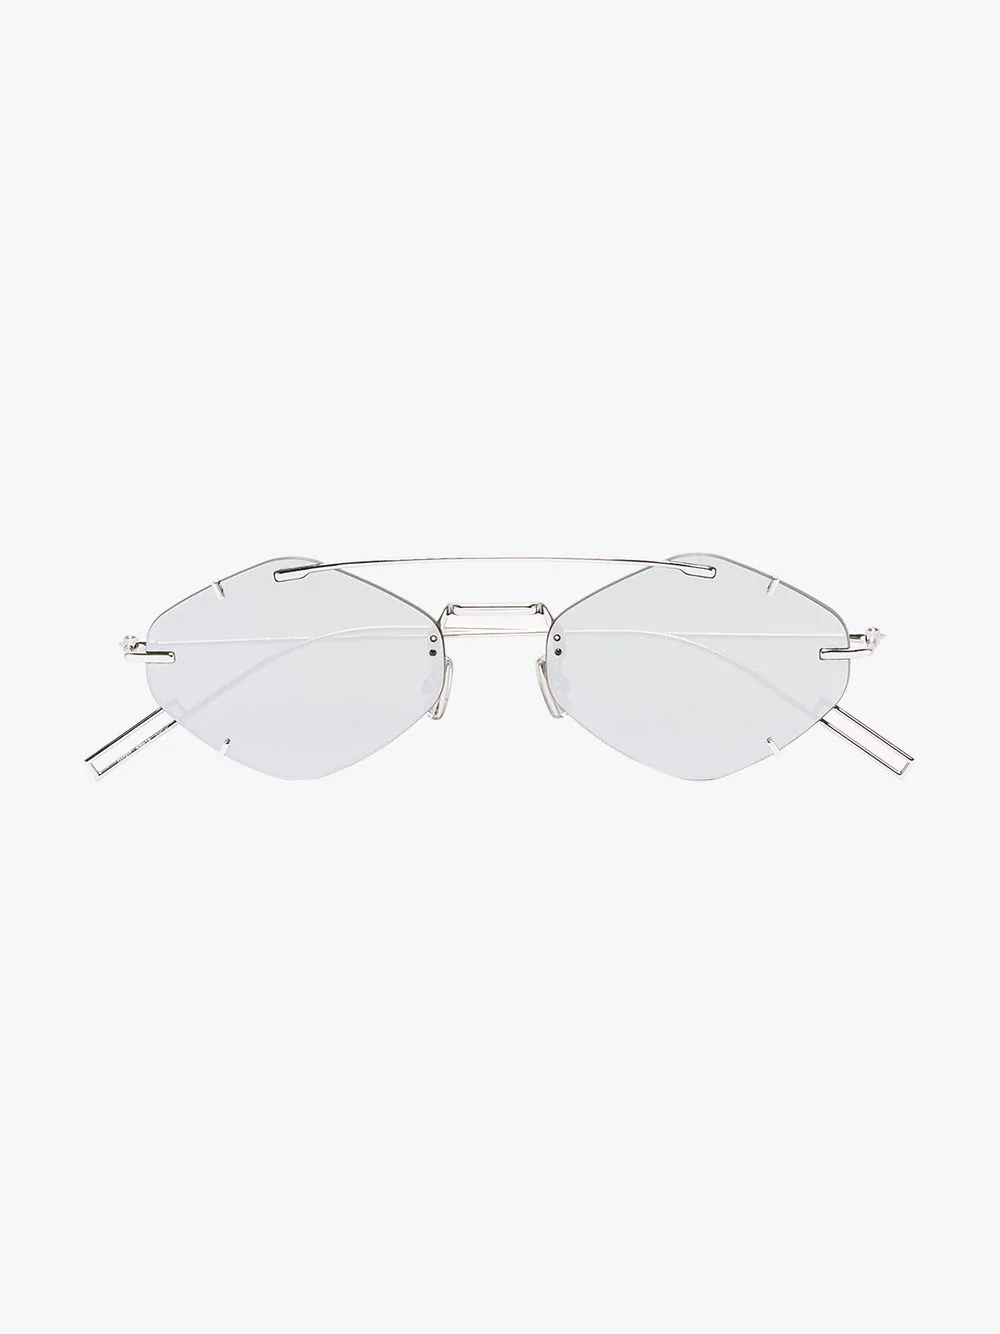 d80d37e87d97 Dior Eyewear Silver Tone Inclusion Geometric Sunglasses - Grey ...